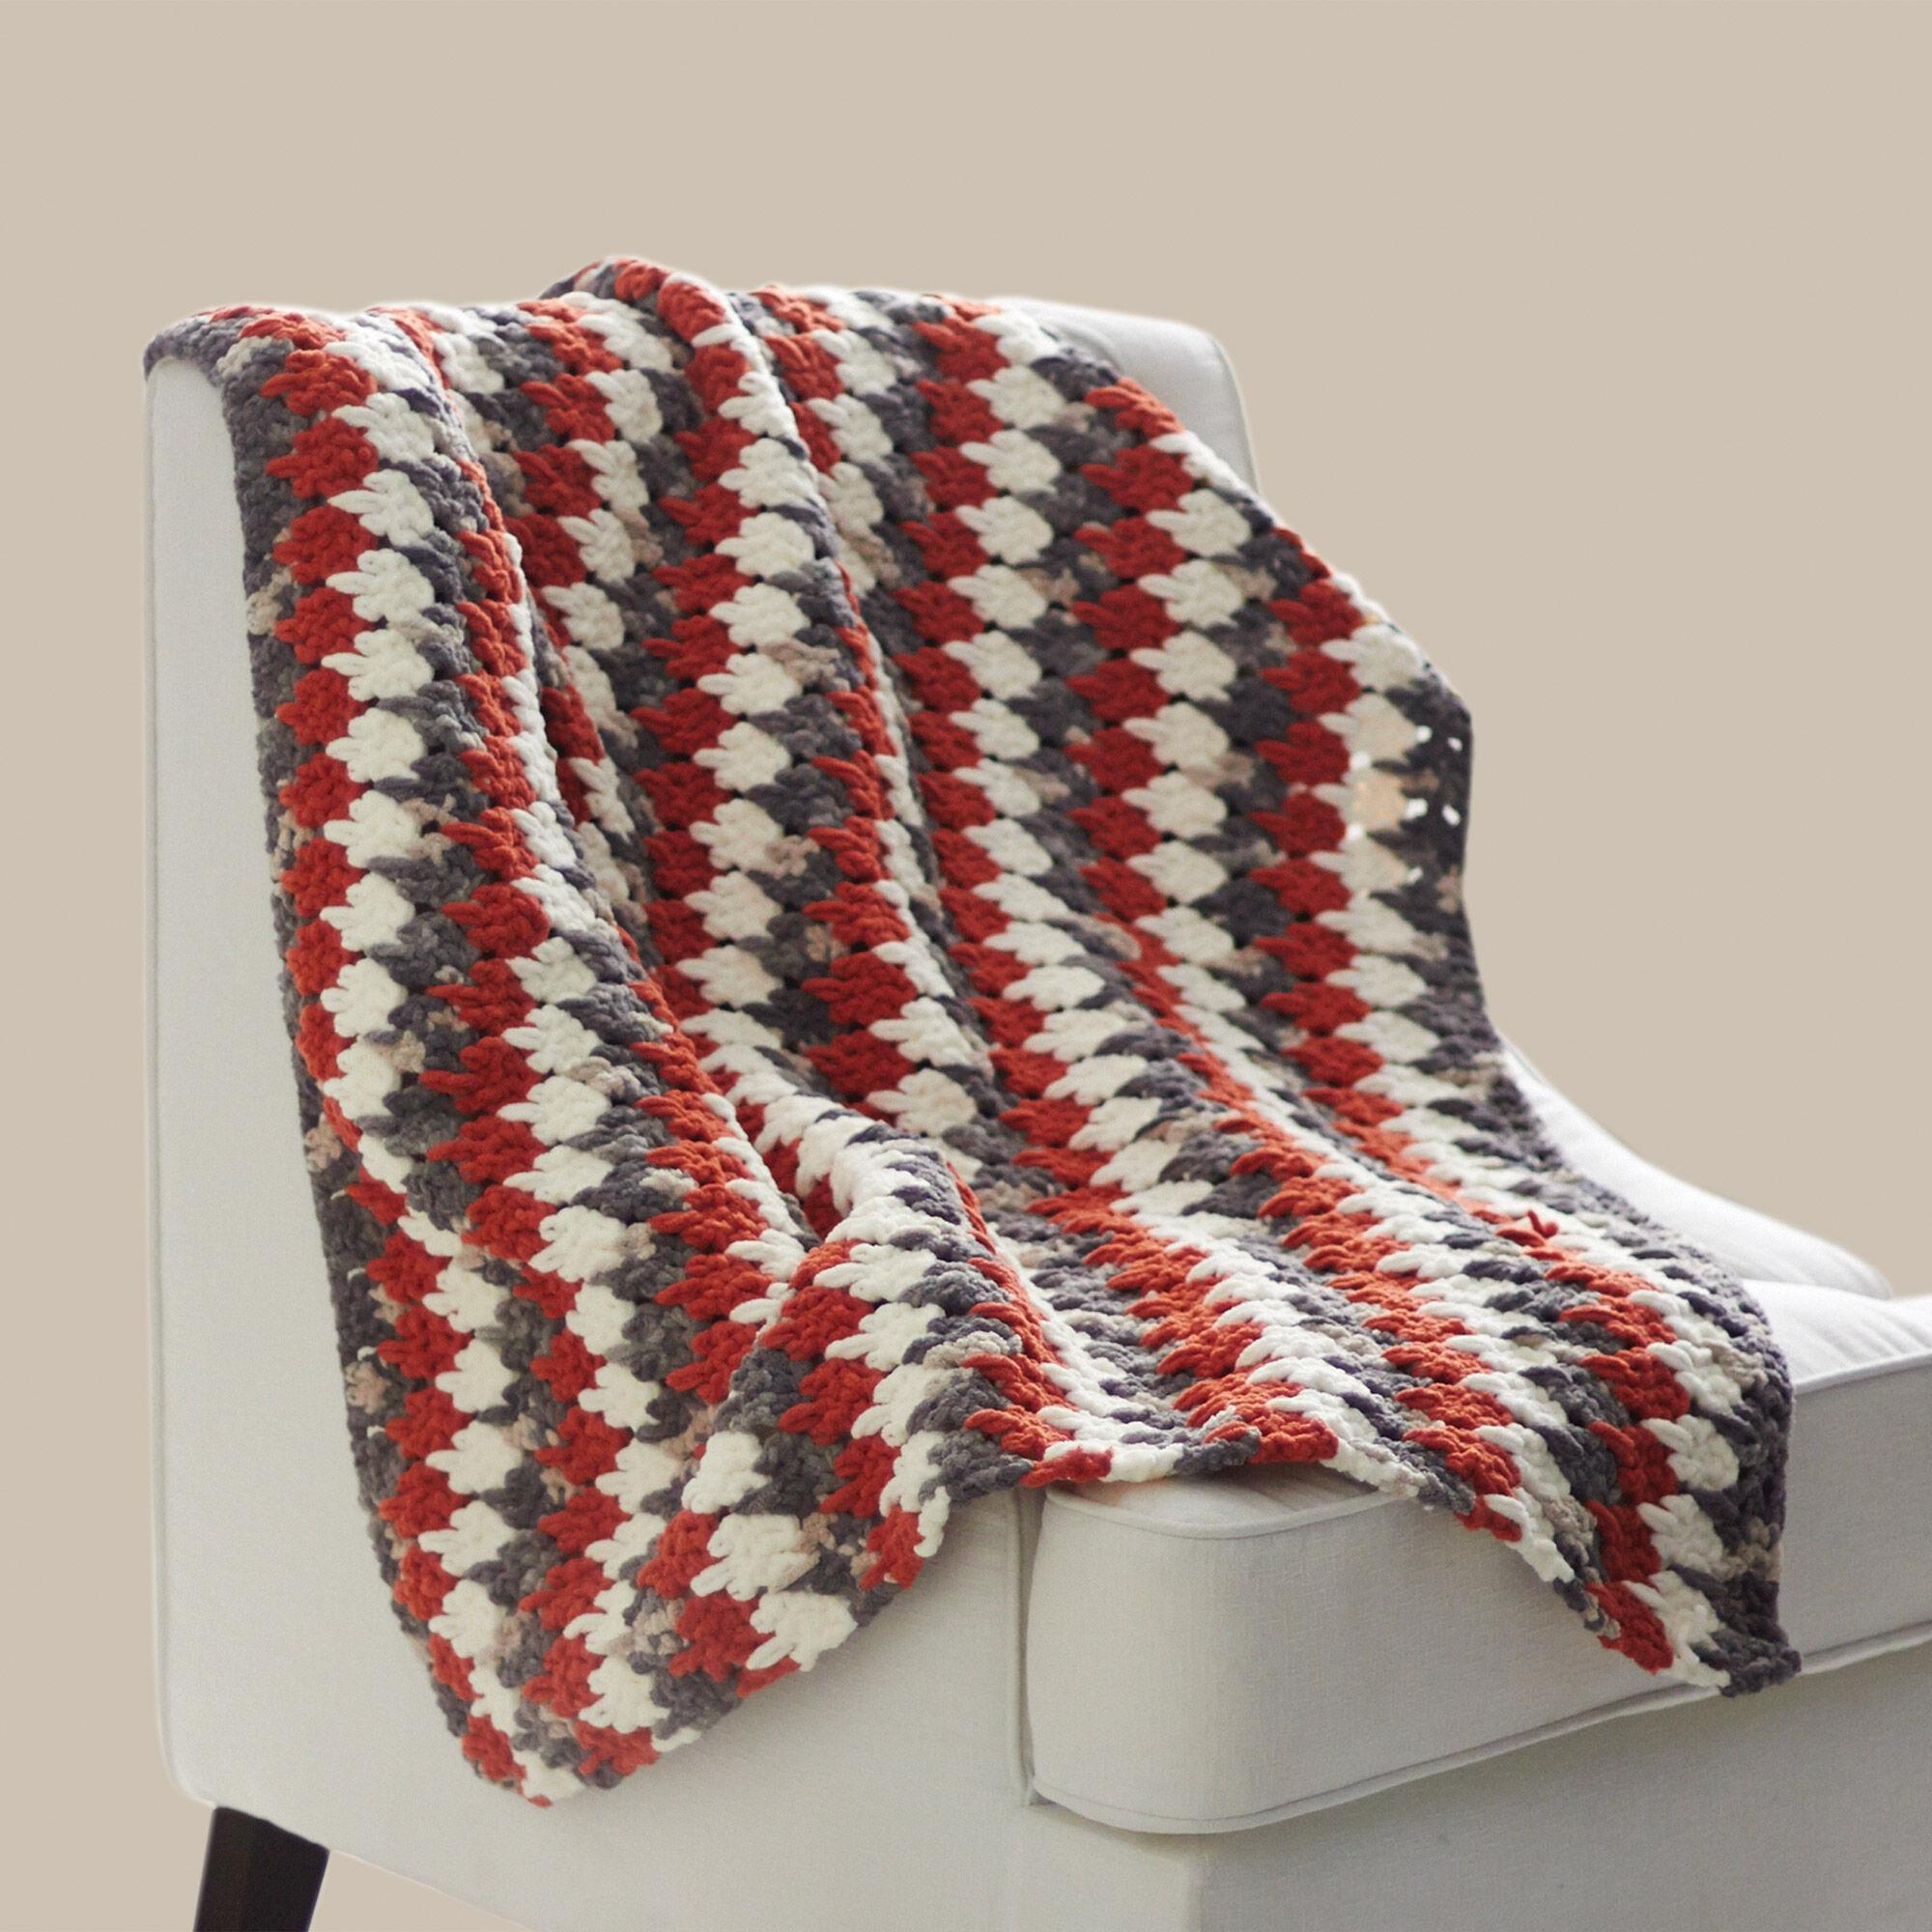 Bernat Blanket Yarn Crochet Patterns Unique Design Ideas